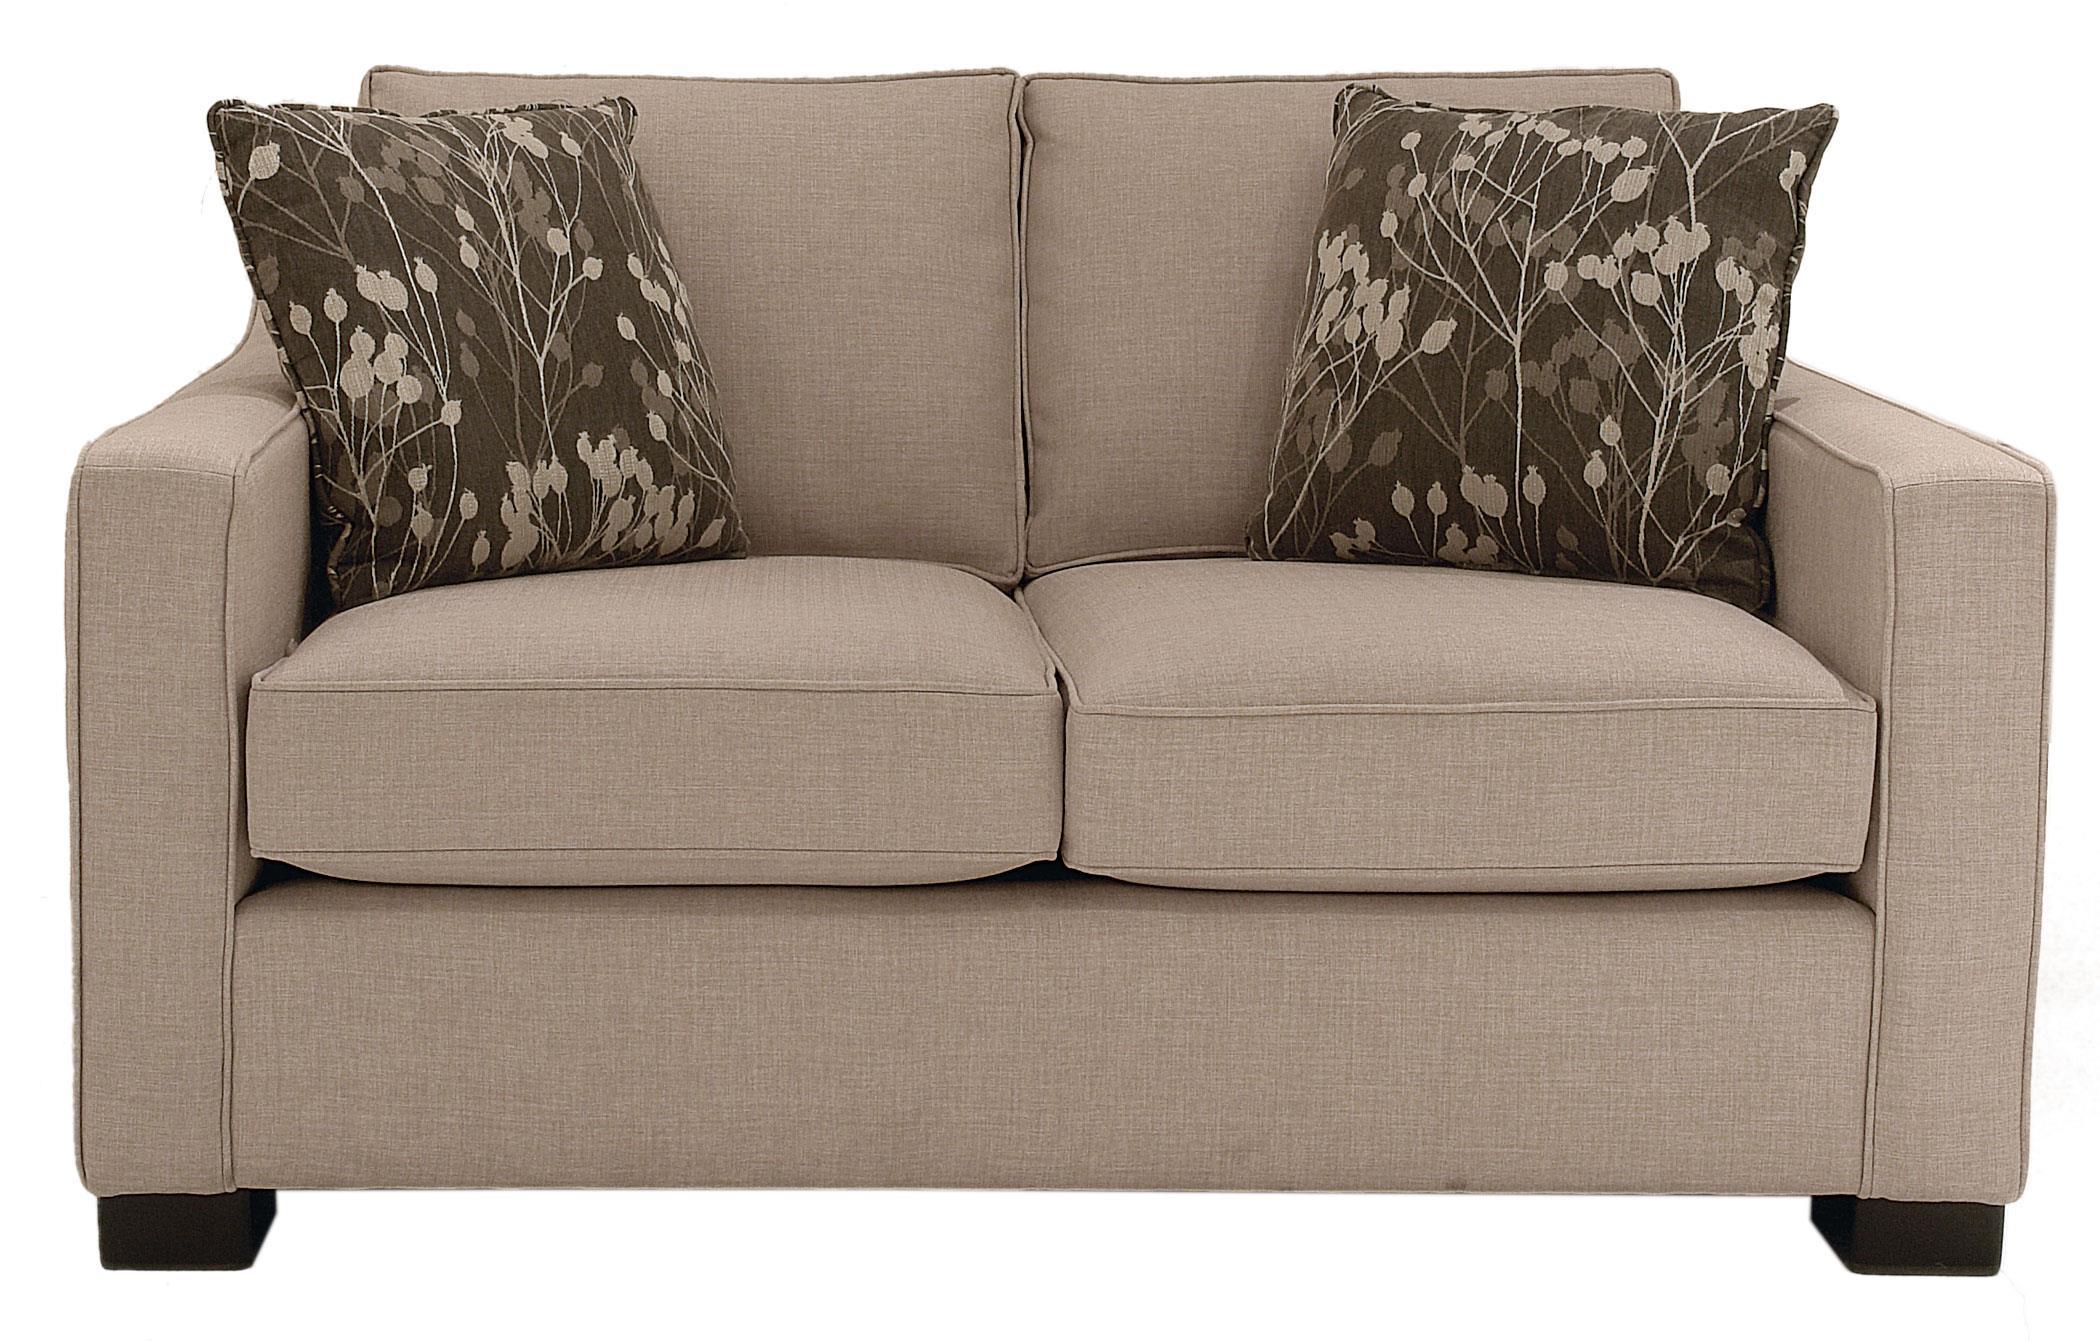 Stylus Metro Love Seat. Hawaii  Oahu  Hilo  Kona  Maui Store   HomeWorld Furniture